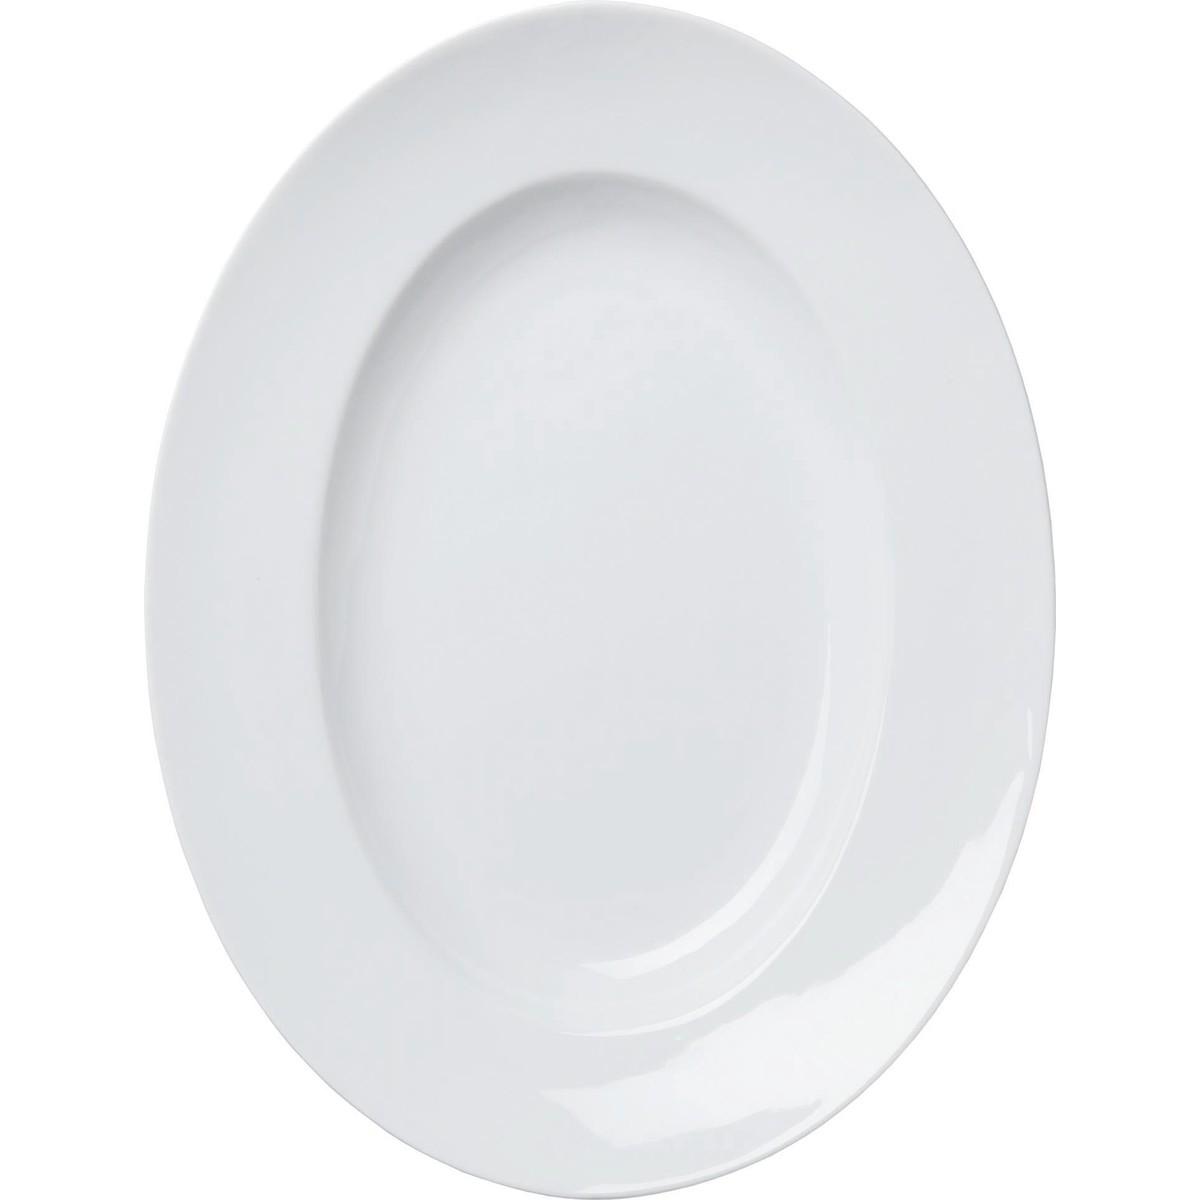 "Teller ""Ovali"" oval, groß"